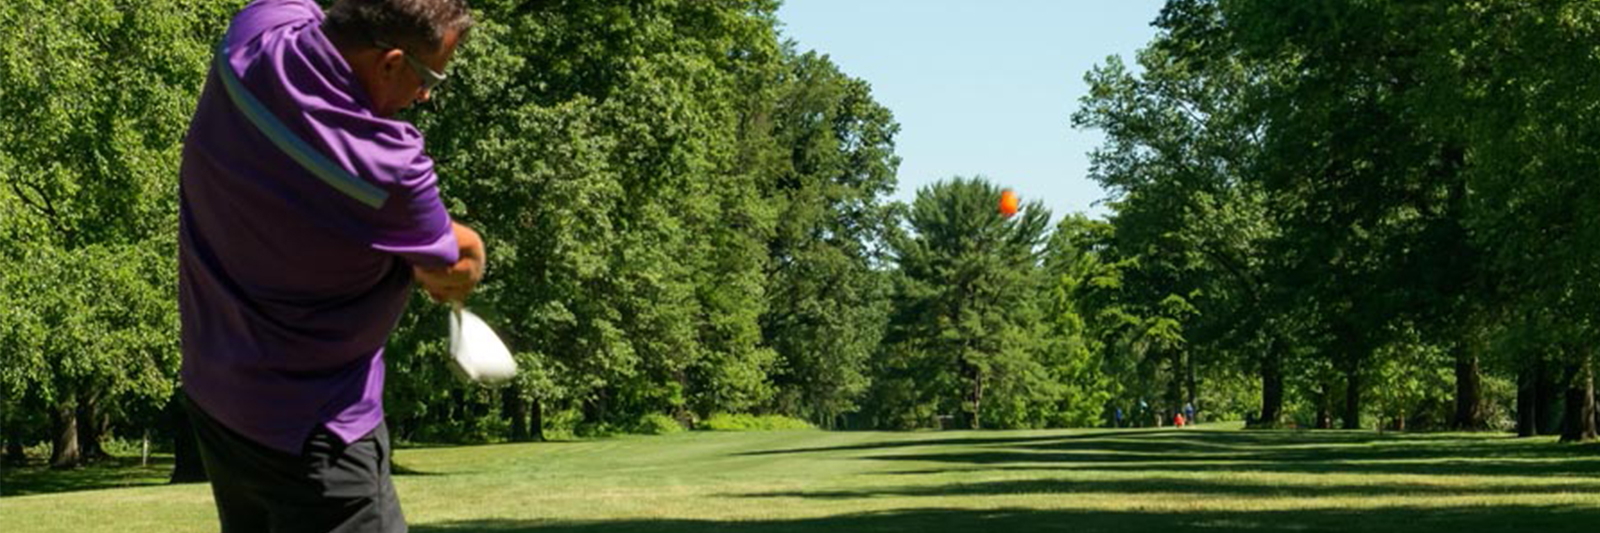 golf-p_2614-1600x533.jpg